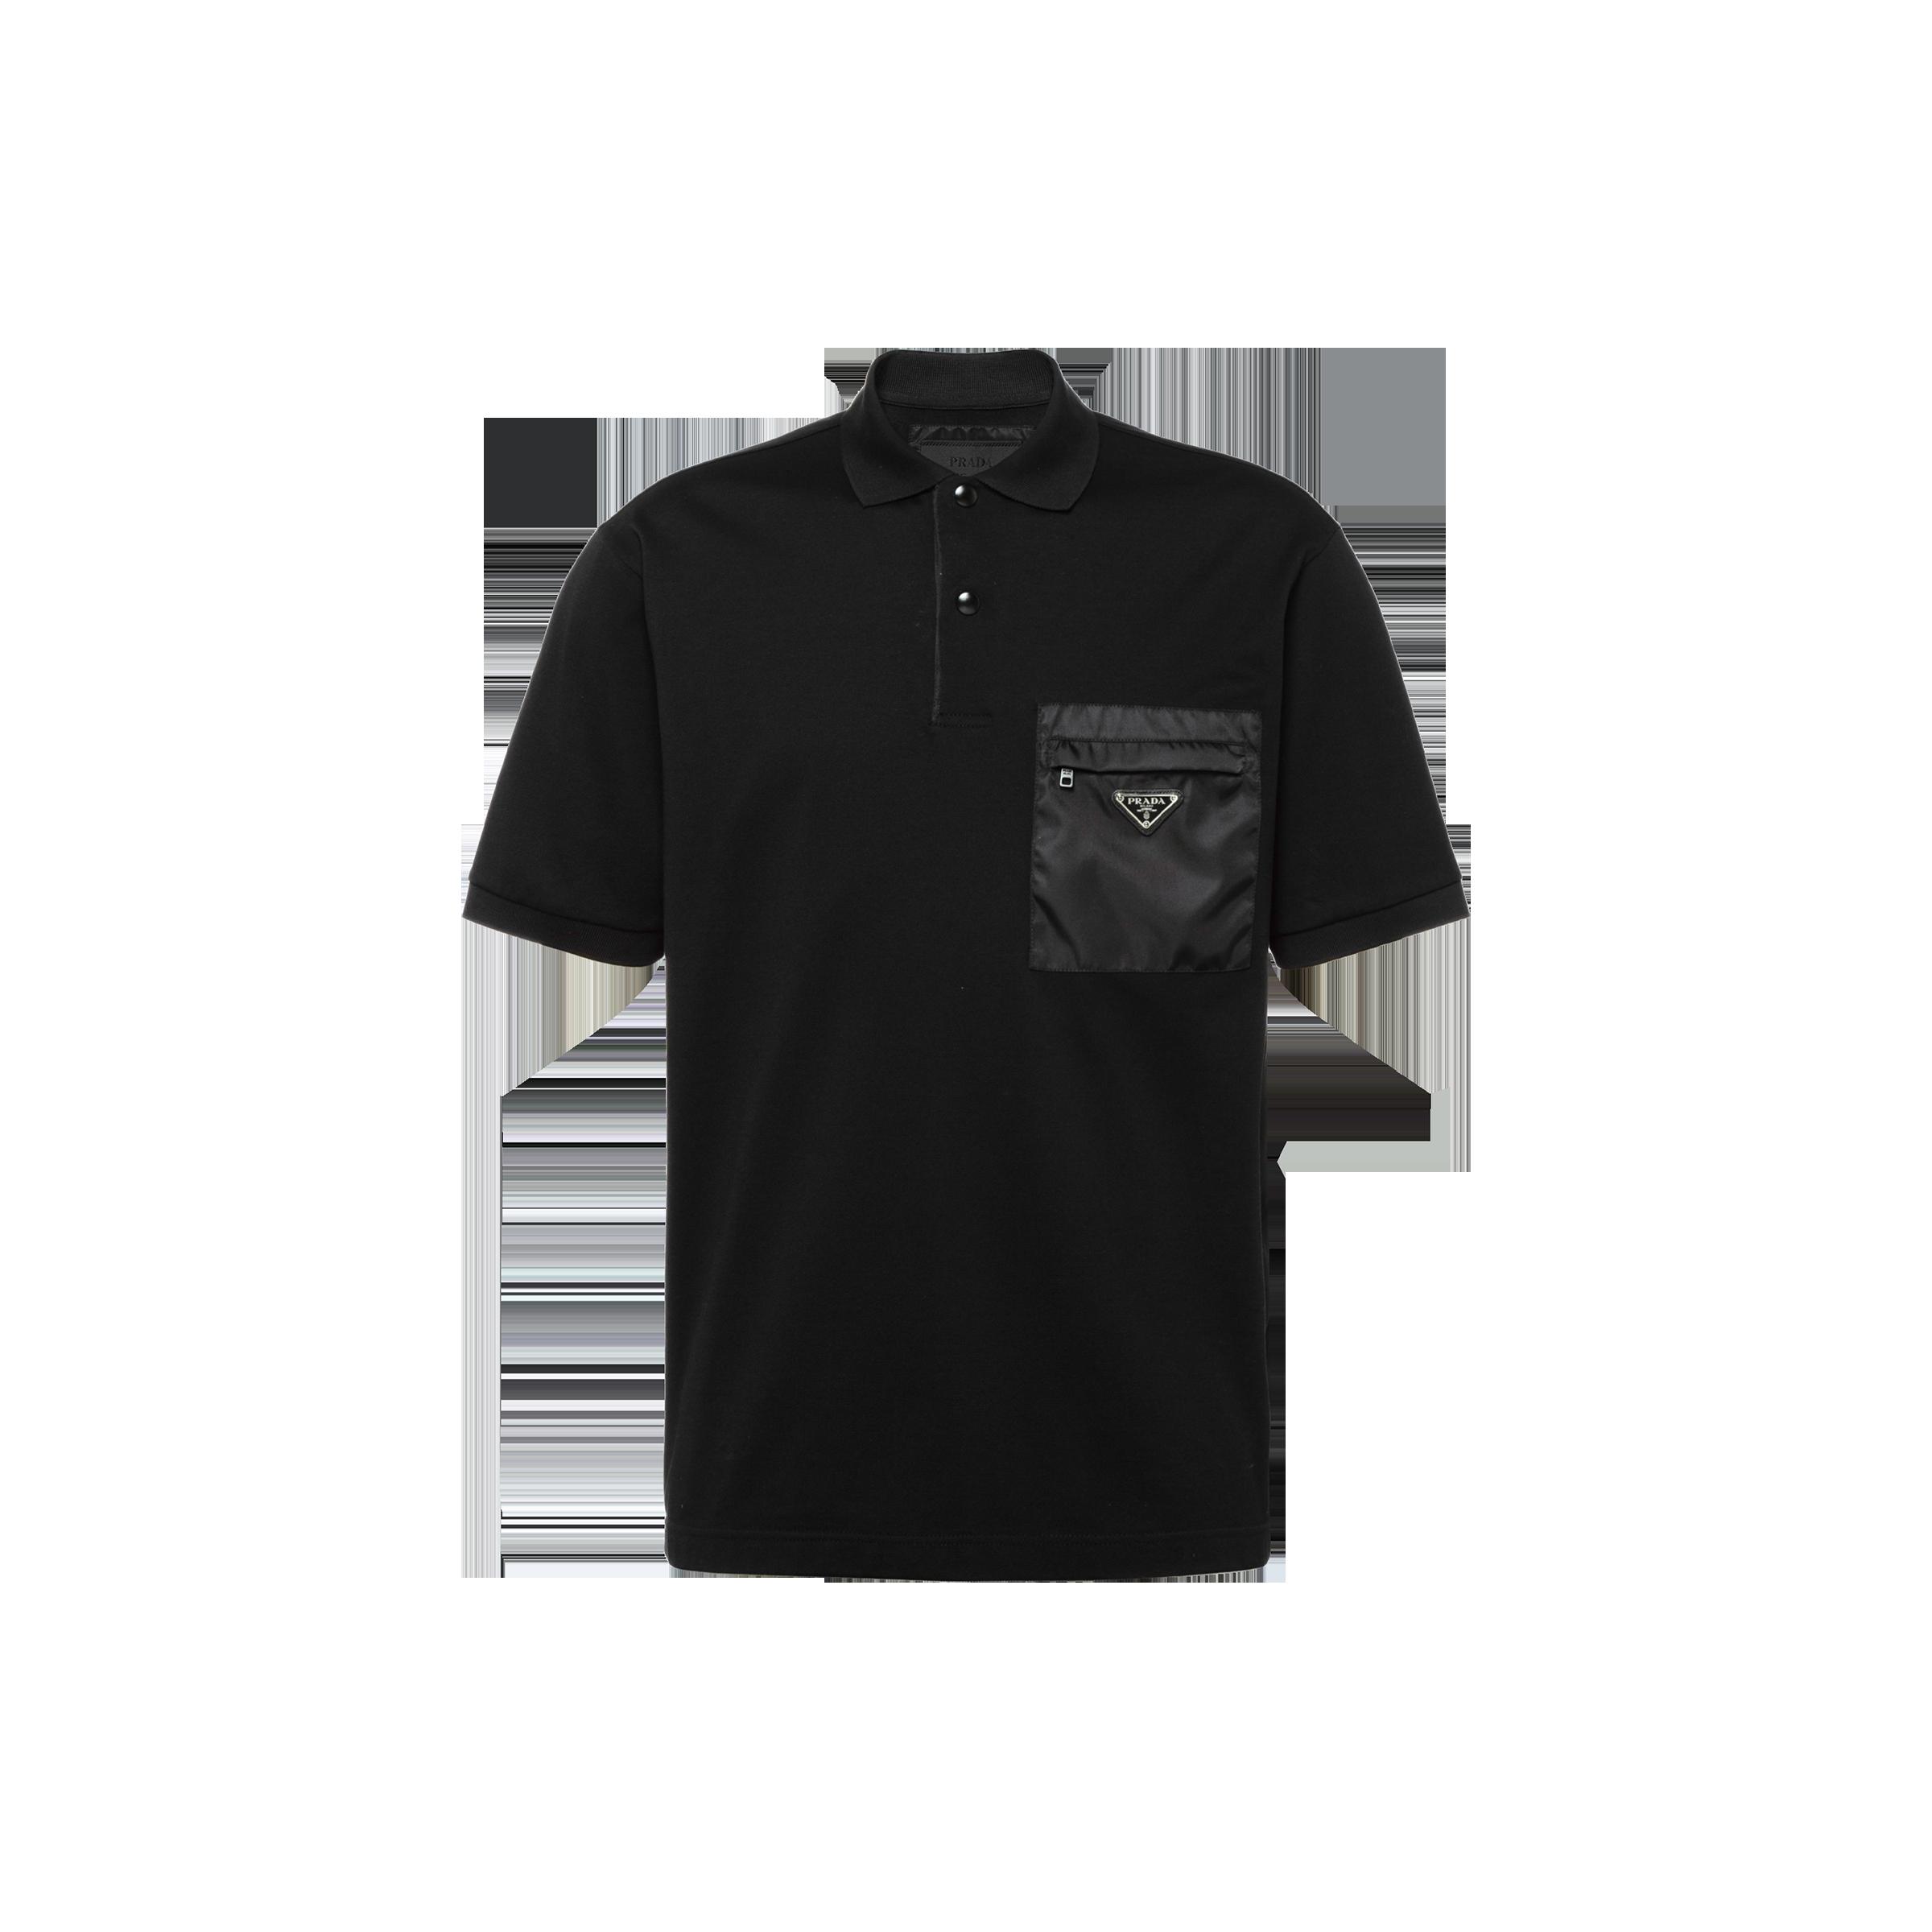 d808c3f13 Men's T-shirts And Polo Shirts   Prada